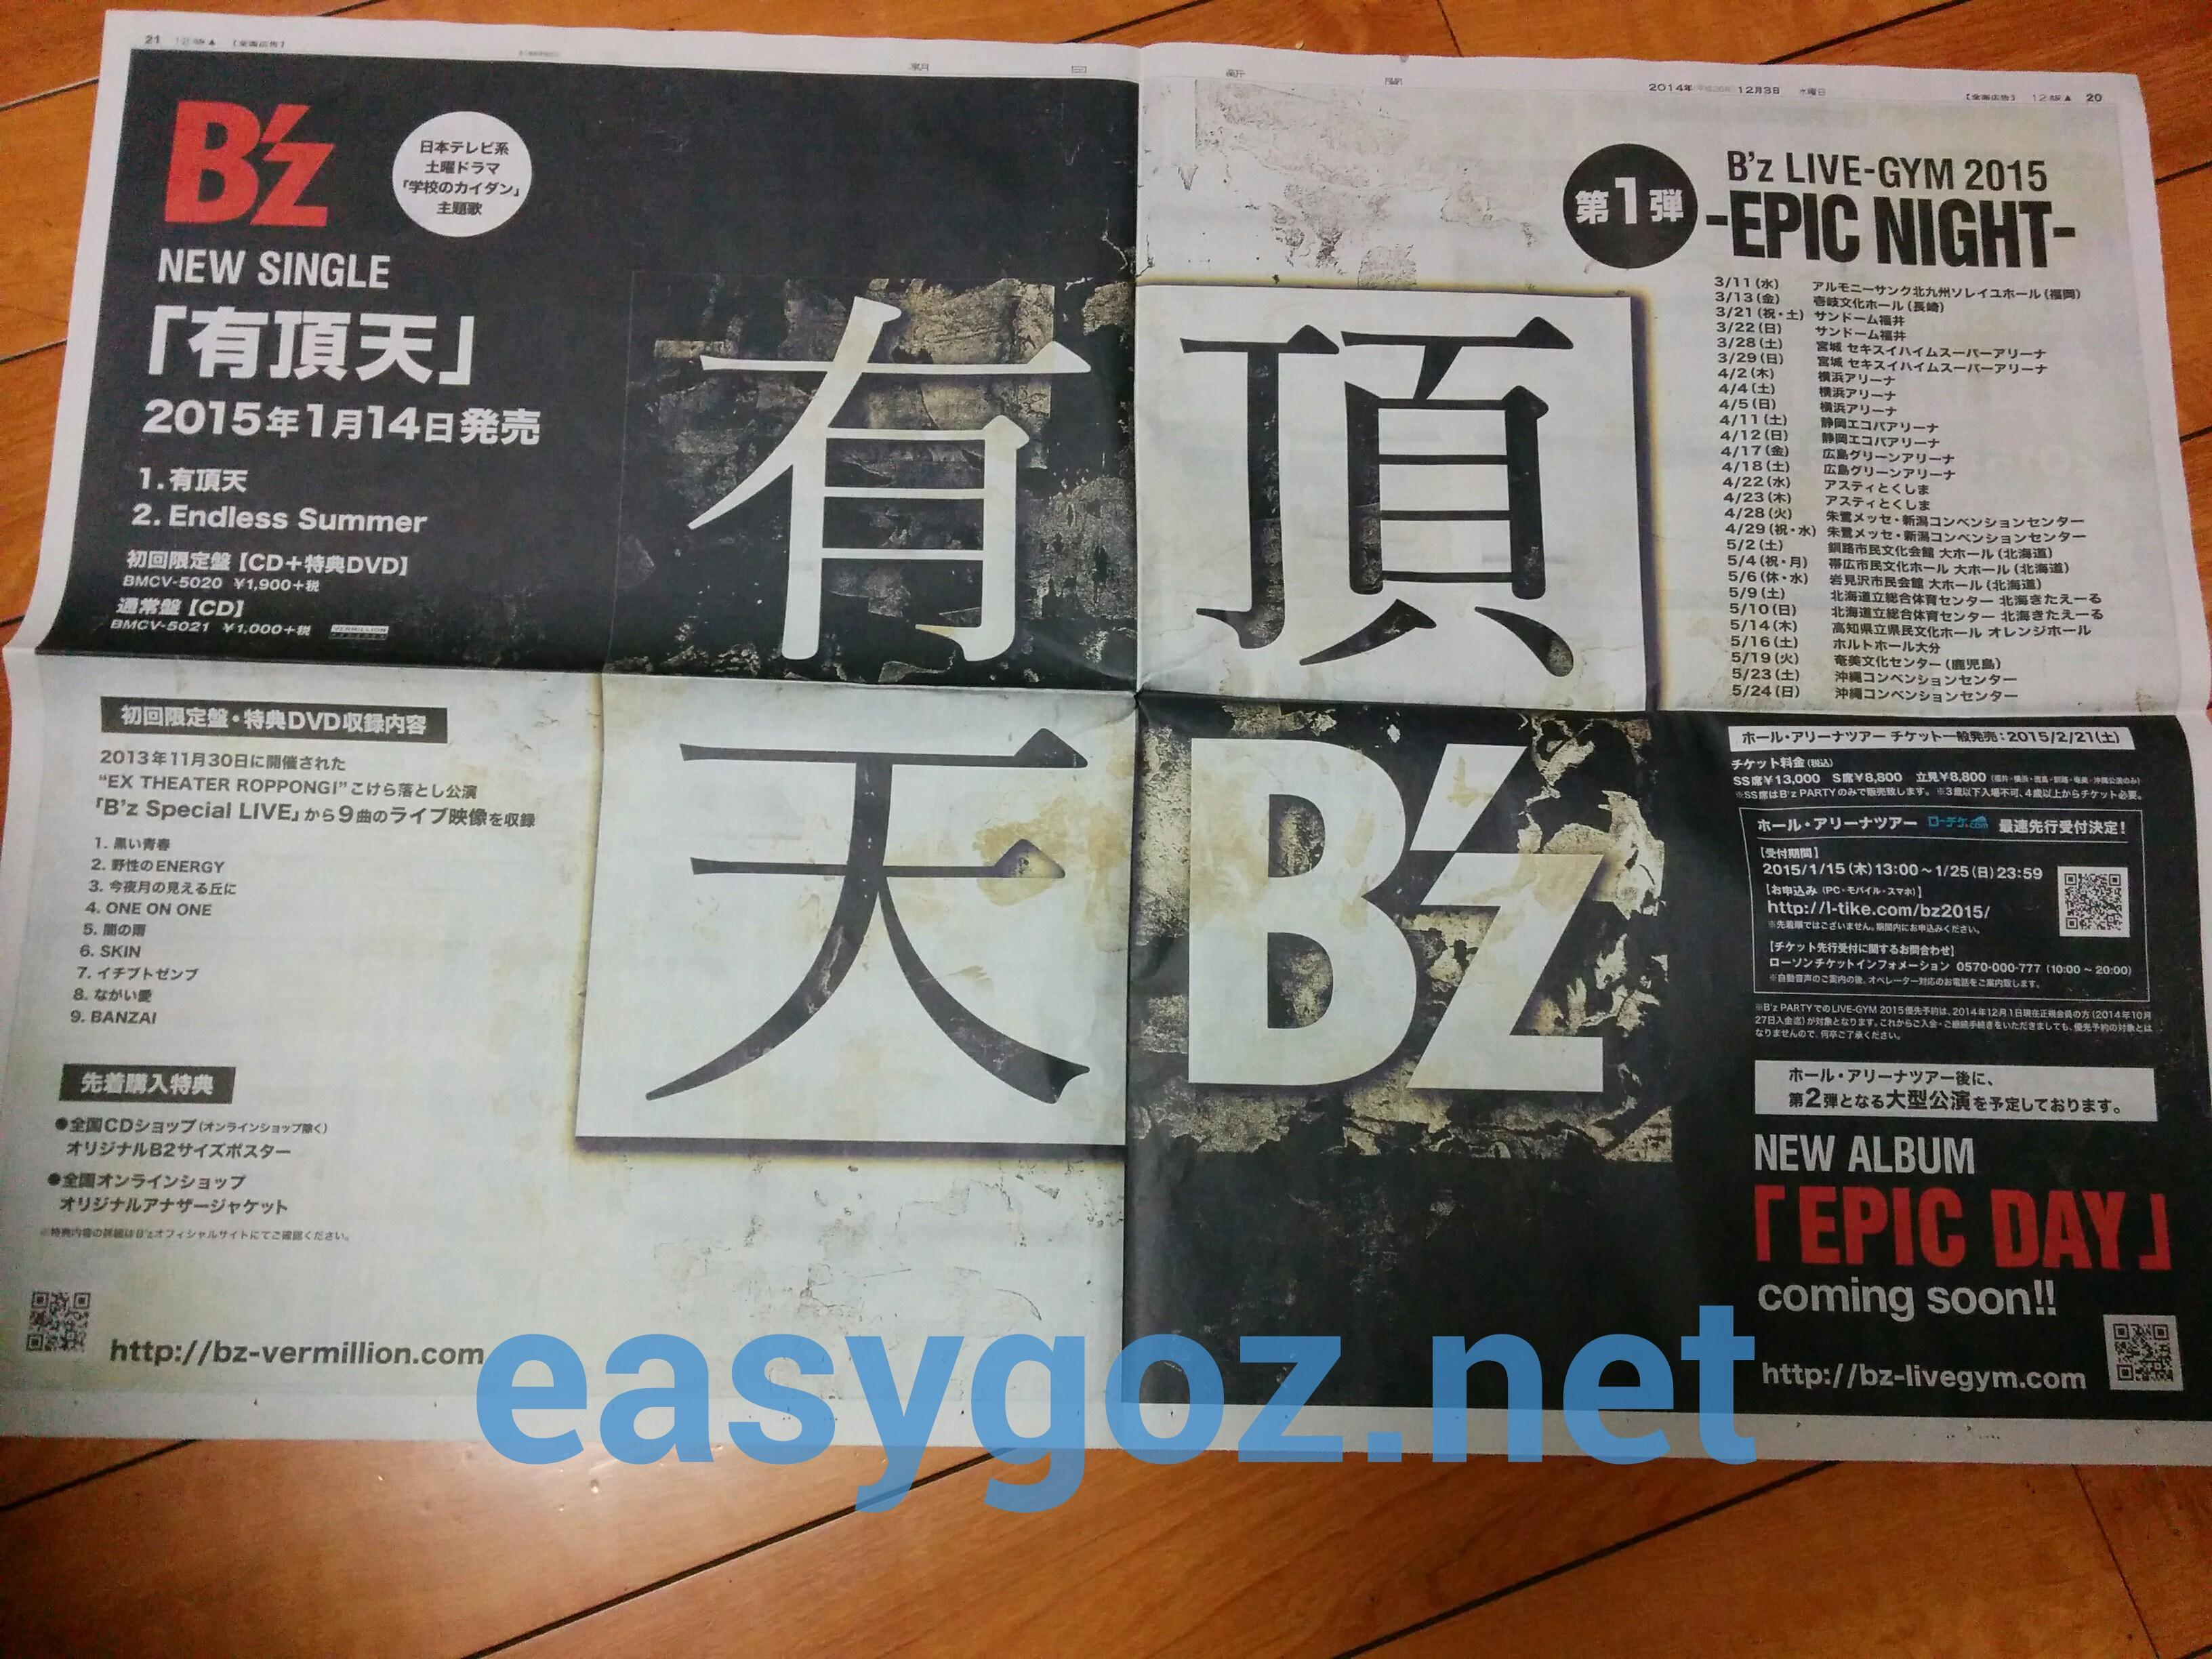 B'z NEWシングル「有頂天」 2015/1/14発売決定! / LIVE-GYM 2015 ツアータイトル決定